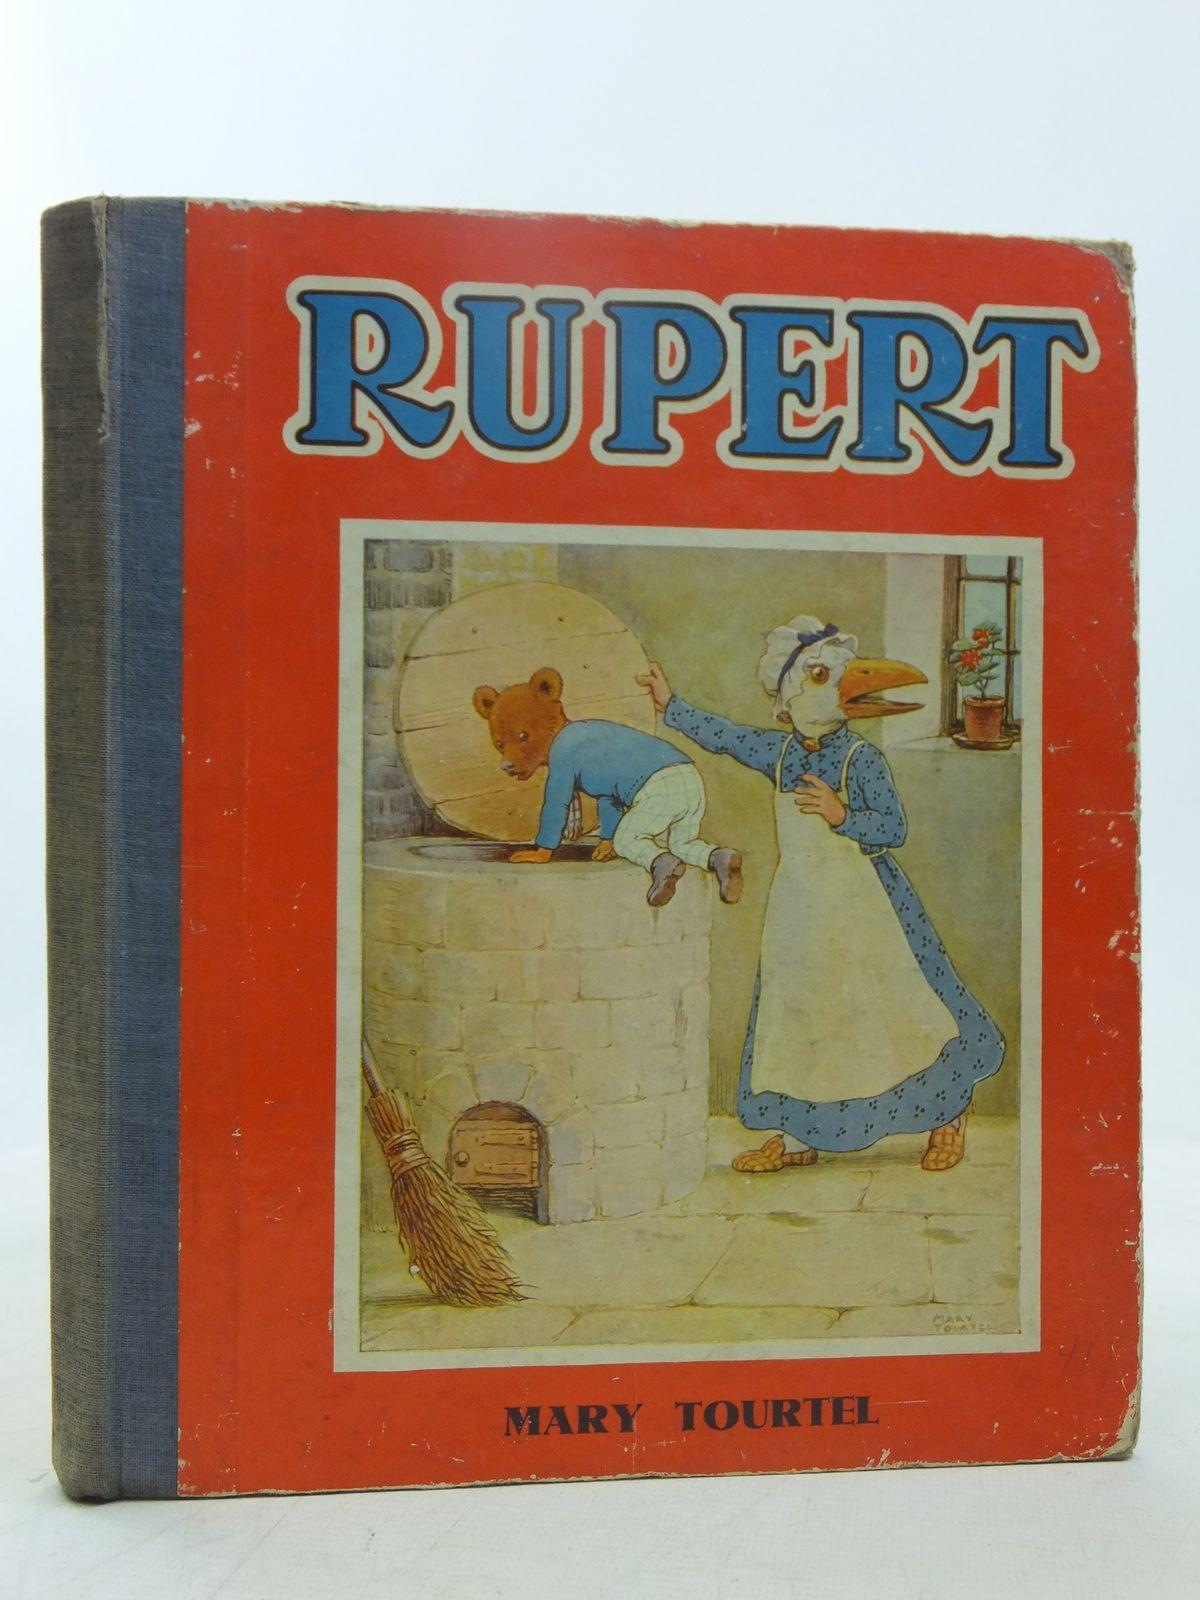 Photo of RUPERT THREE STORIES OF THE LITTLE BEARS ADVENTURES